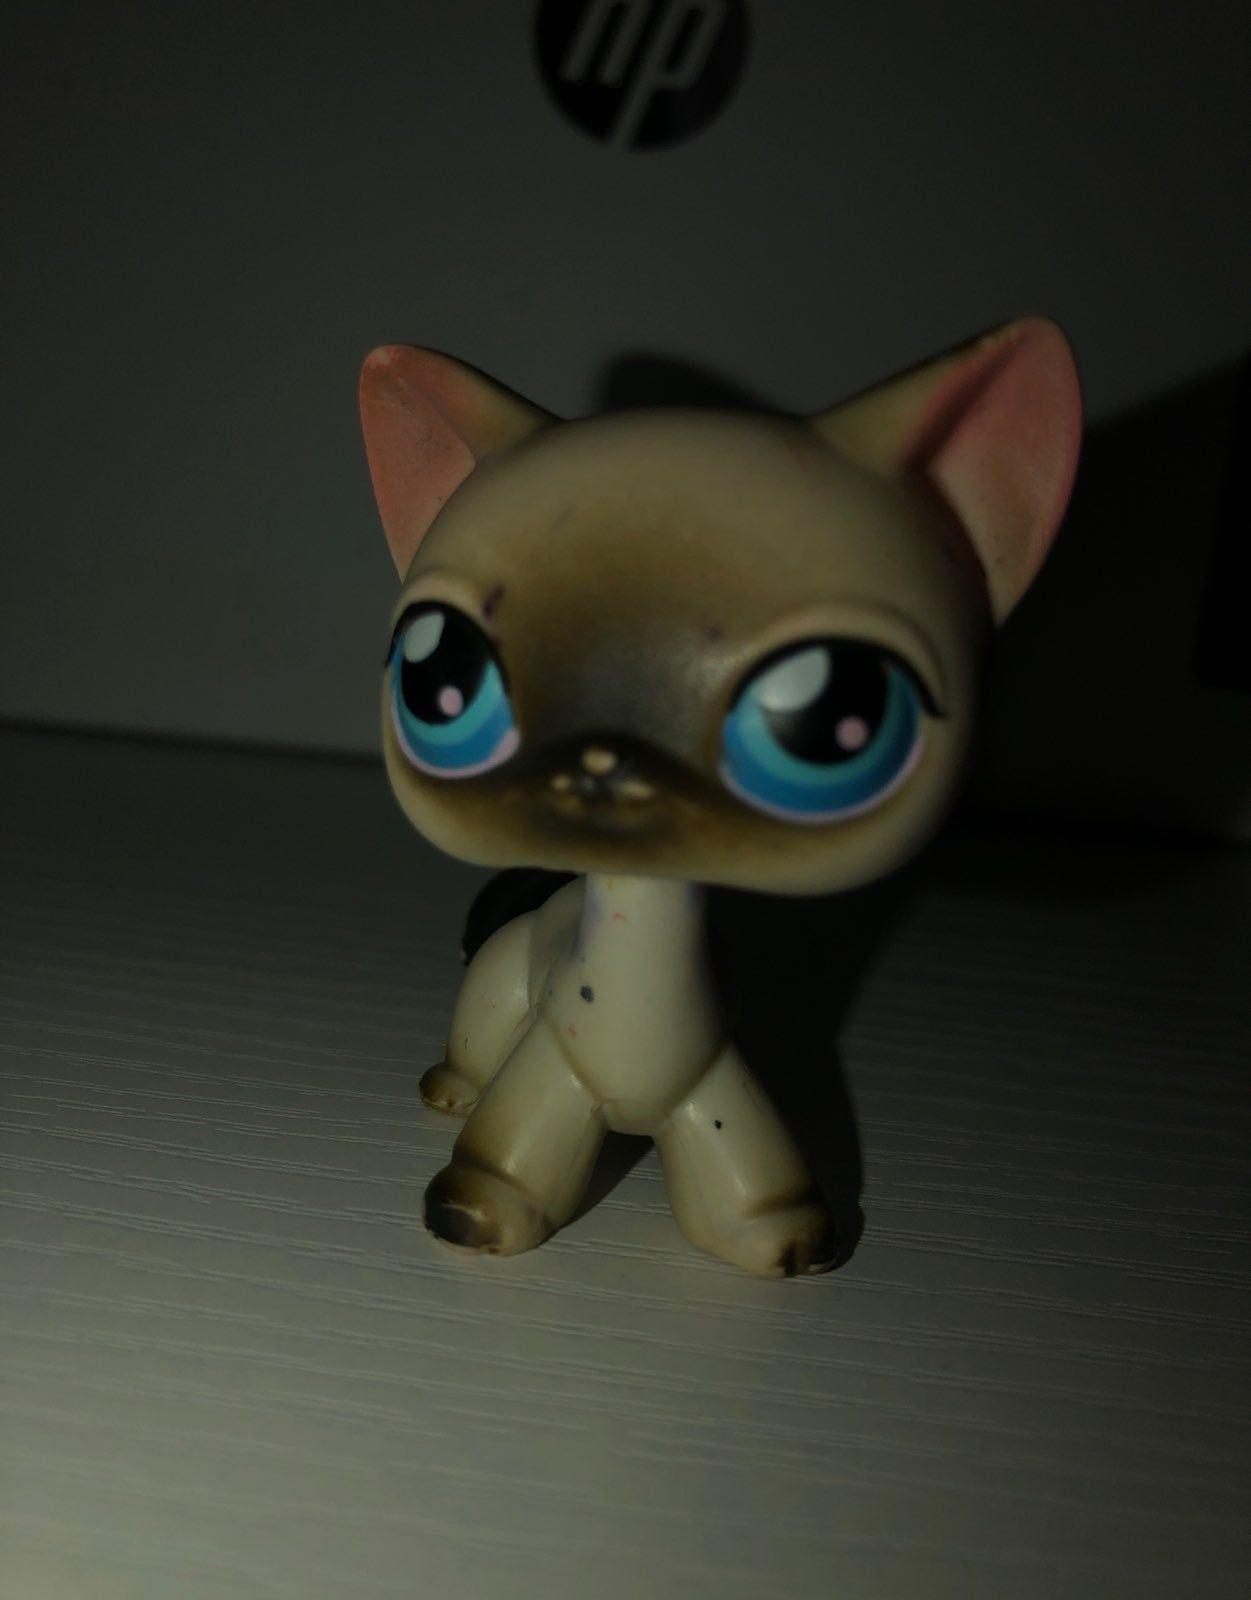 Pin On Littlest Pet Shop Mini Figures